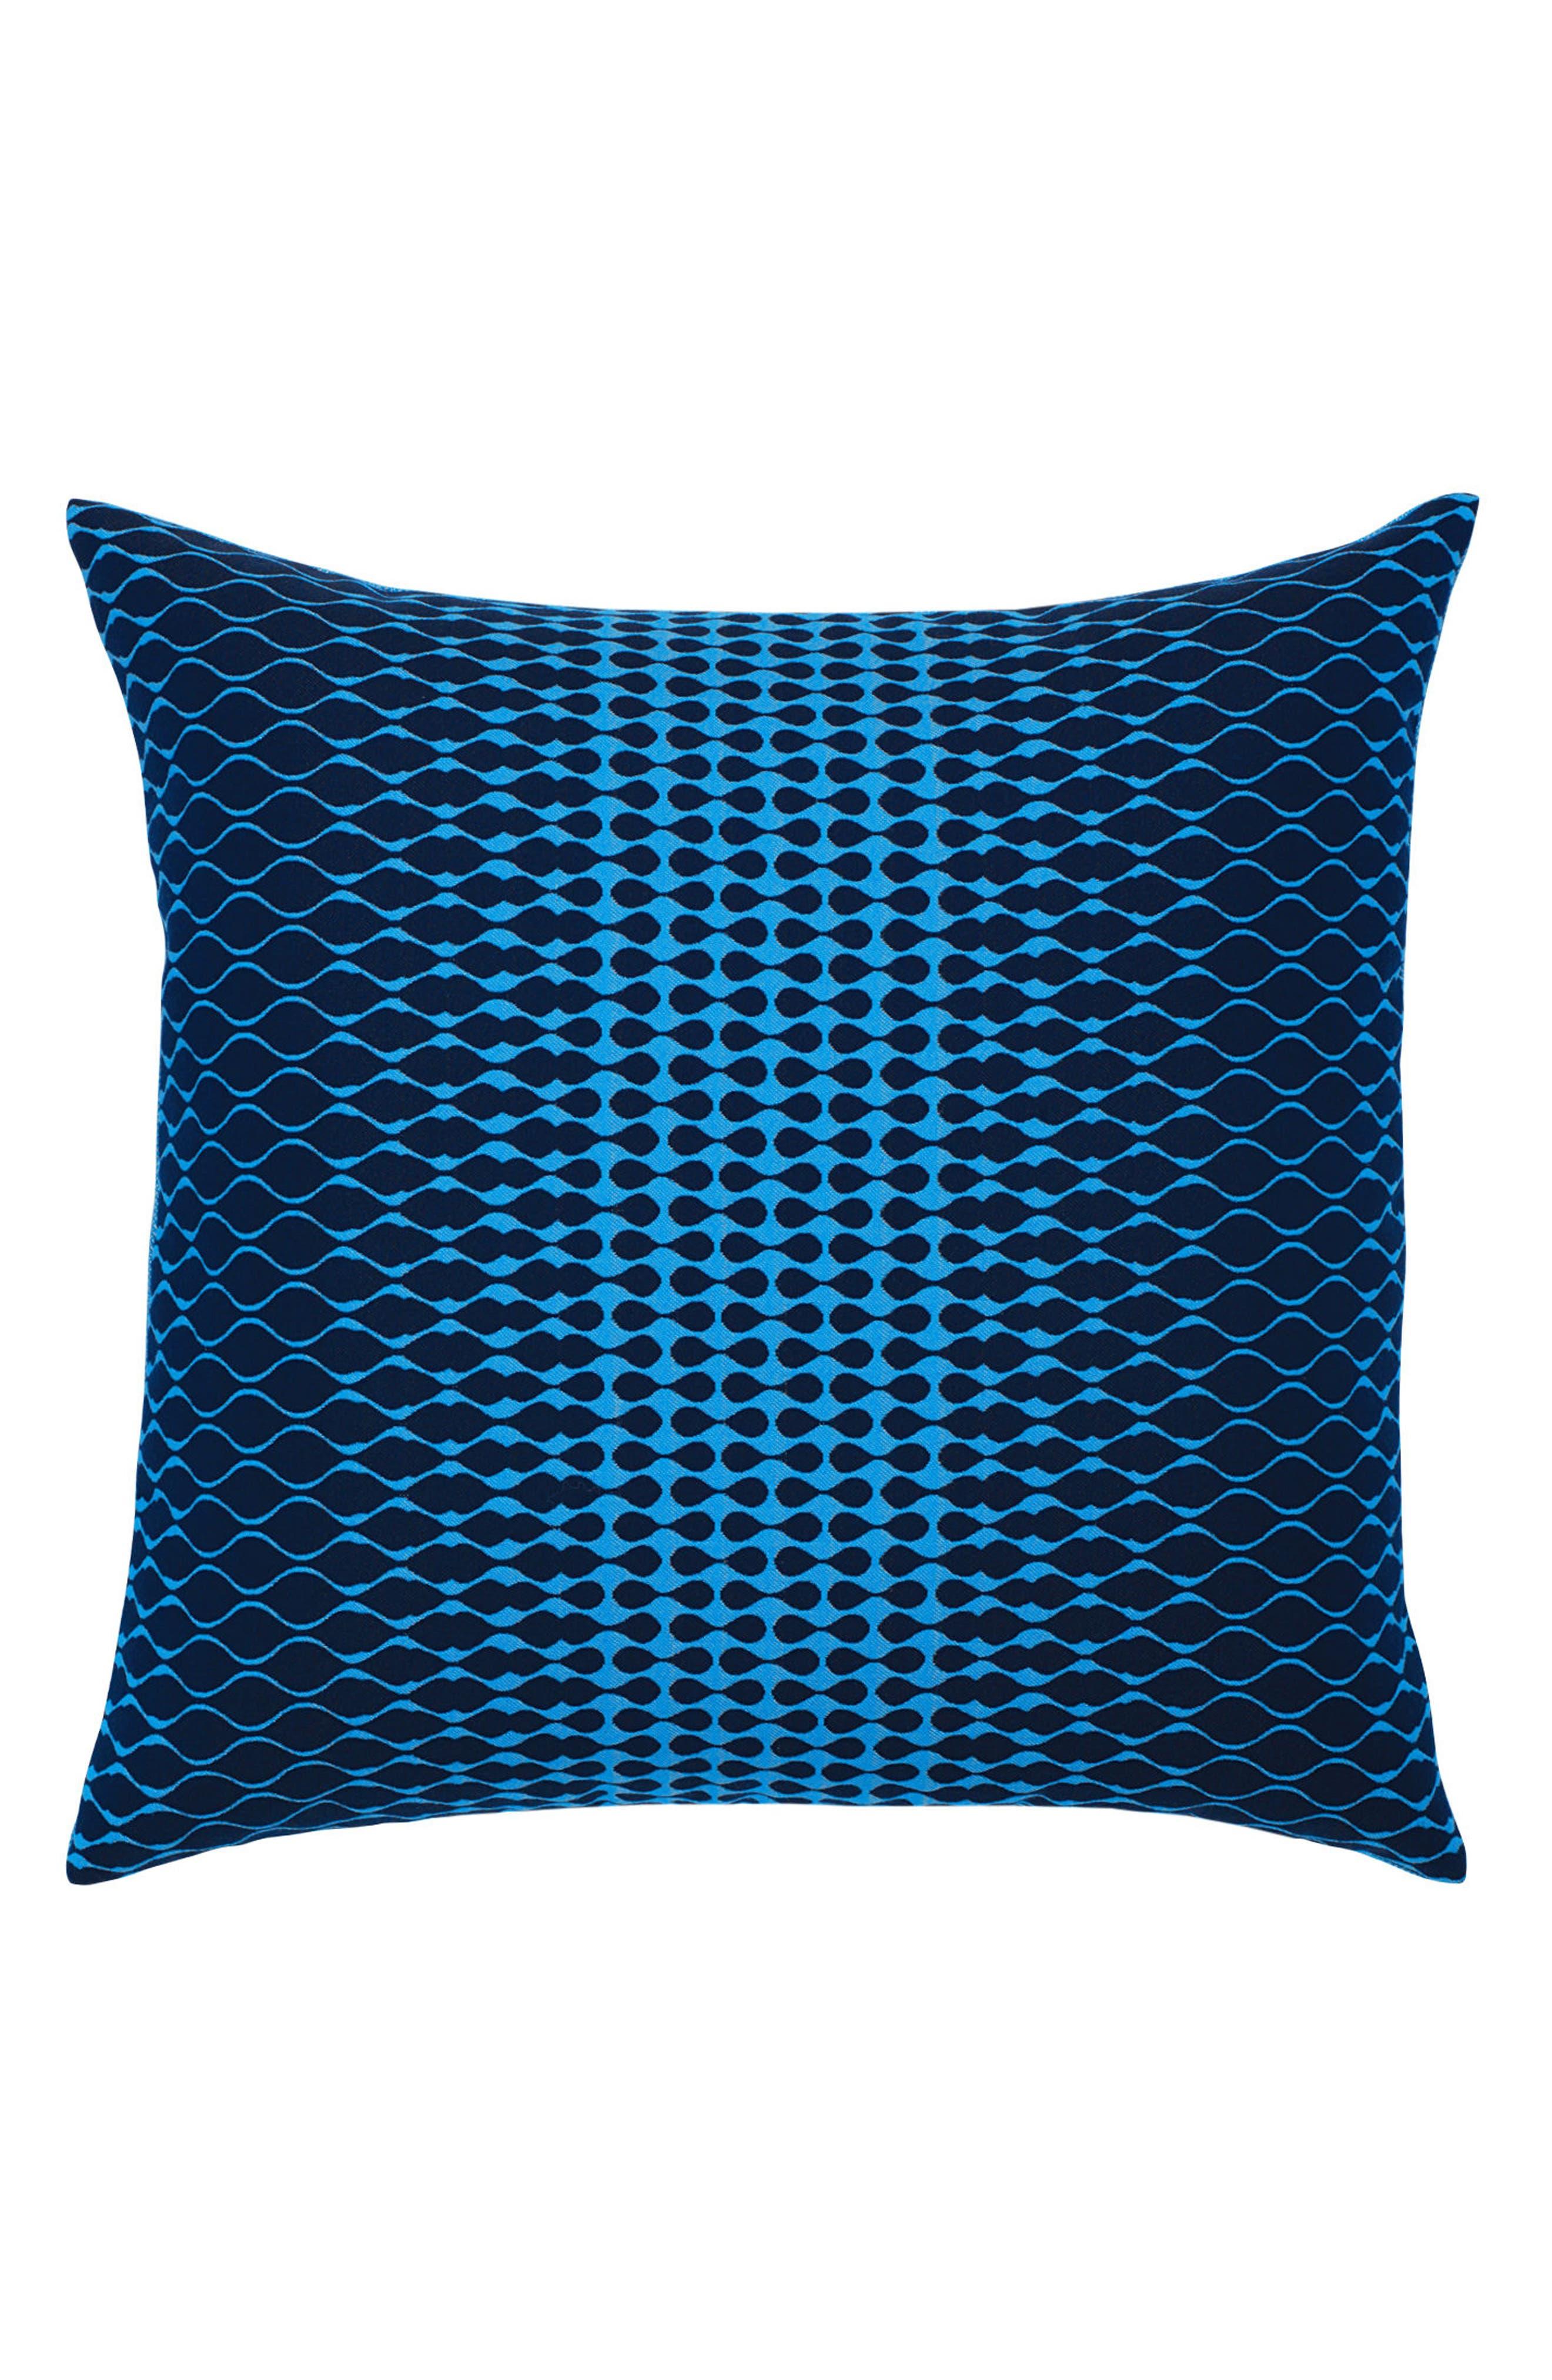 Optic Azure Indoor/Outdoor Accent Pillow,                         Main,                         color, Blue